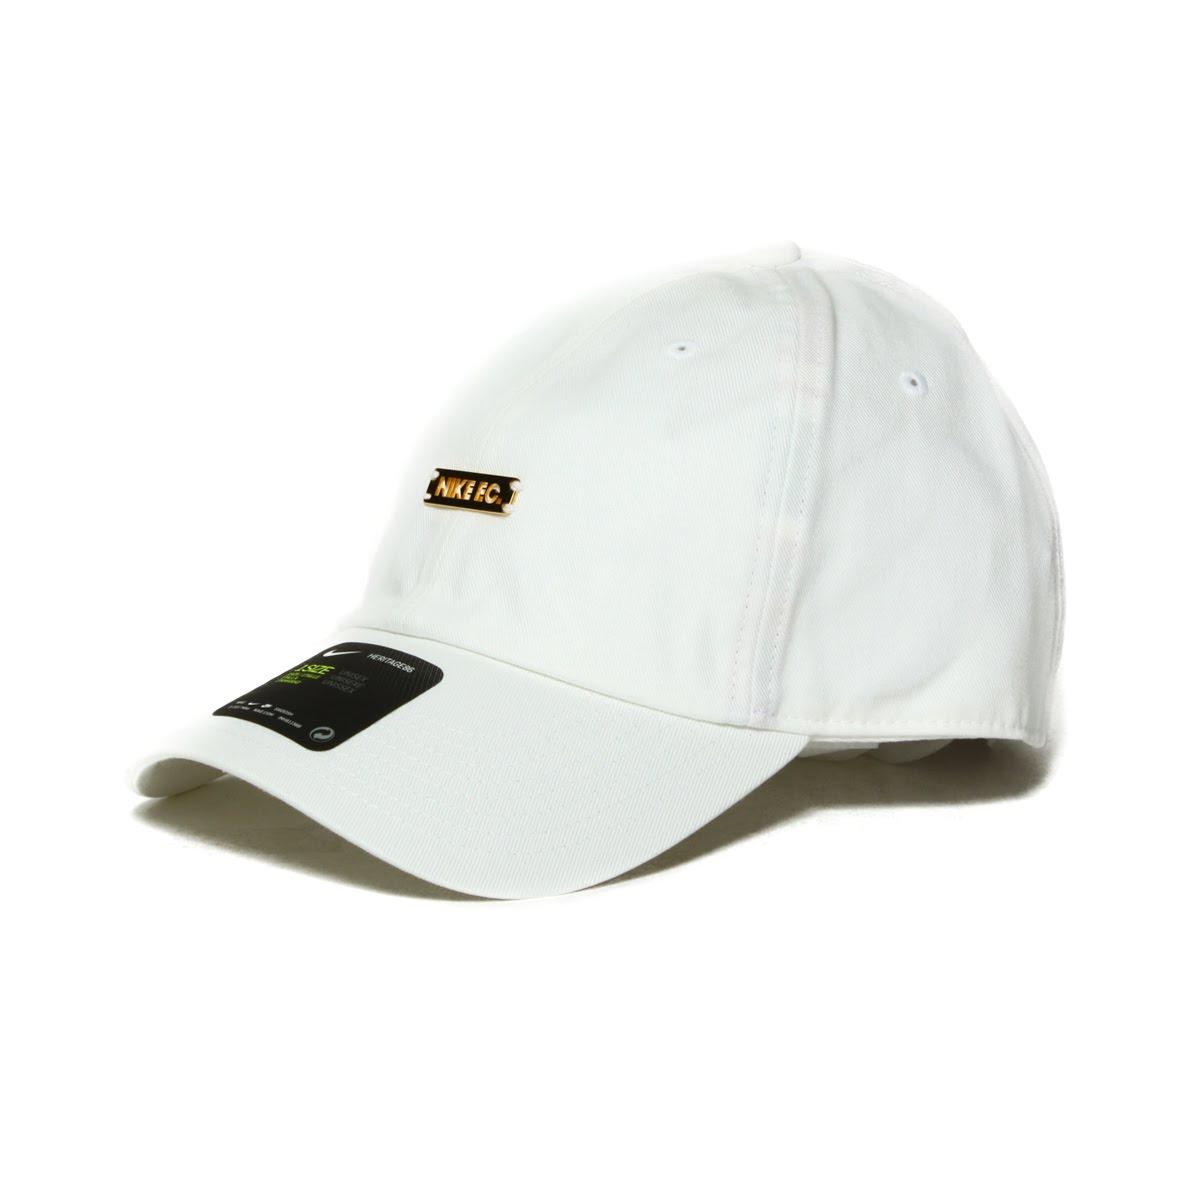 NIKE U NK FC H86 CAP ADJ (Nike FC H86 ADJ cap) WHITE METALLIC GOLD 18SS-I 007c5bfc541